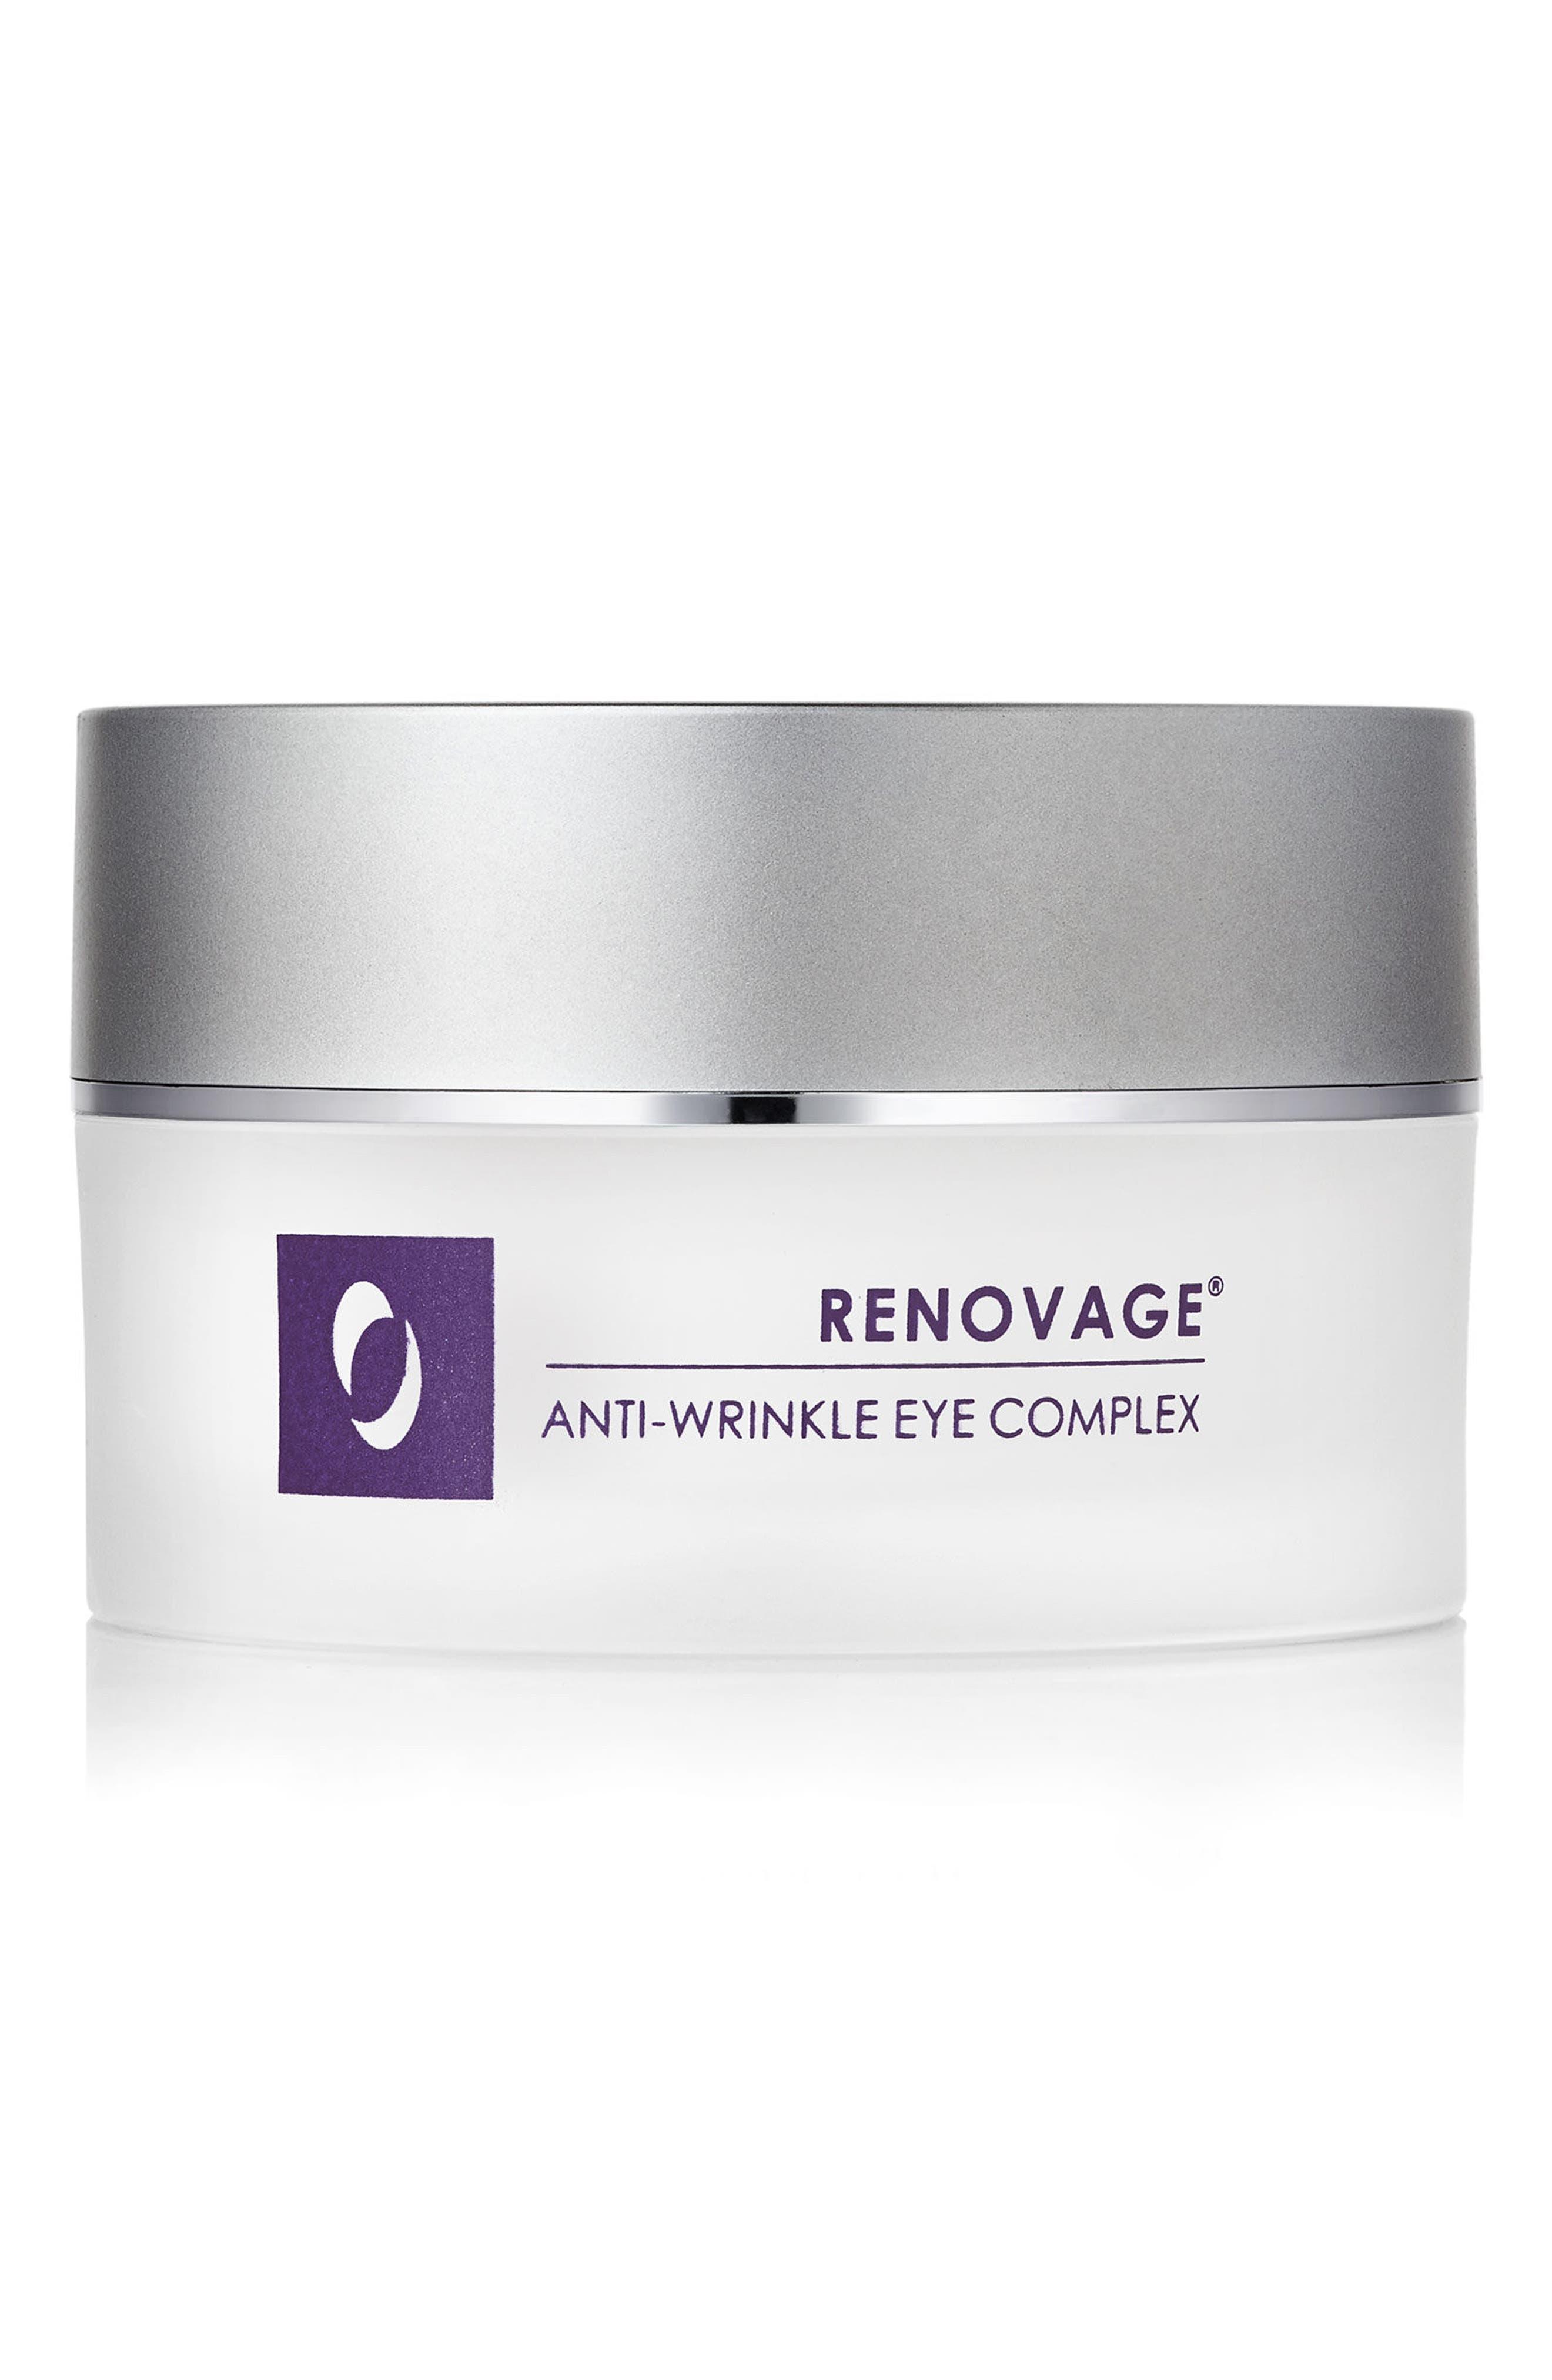 Renovage<sup>™</sup> Anti-Wrinkle Eye Complex,                             Main thumbnail 1, color,                             000